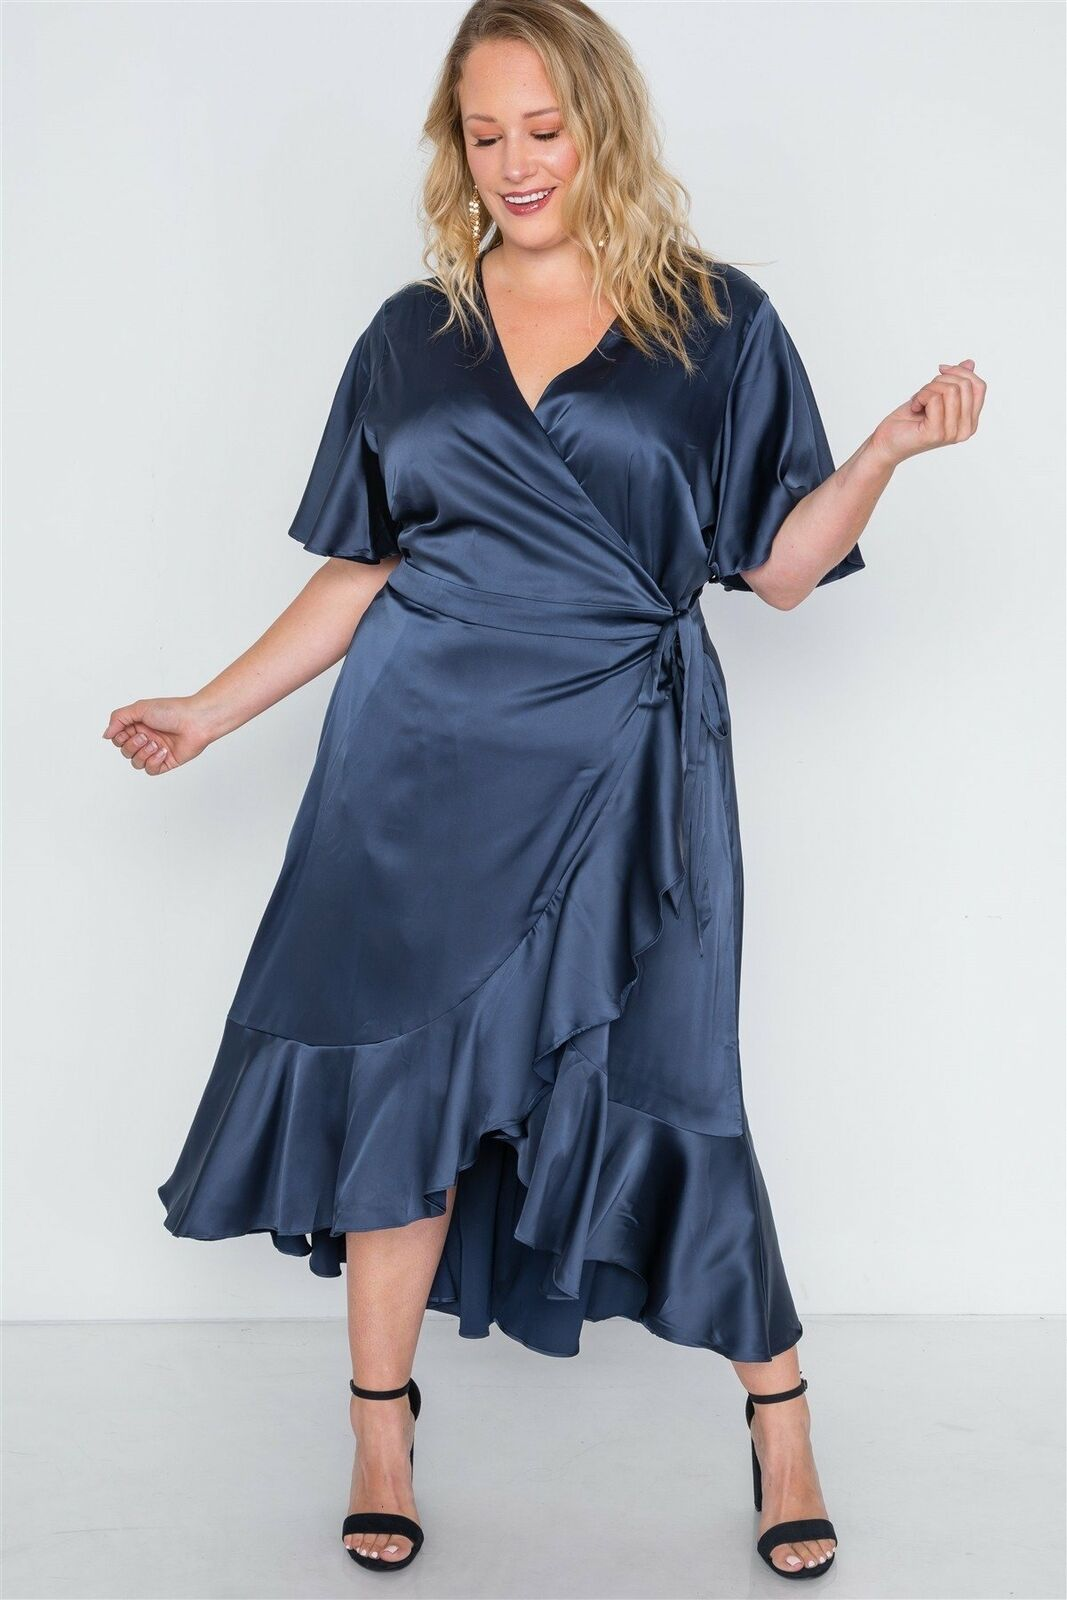 Plus Size Satin Flounce Dress () - Plus Size Dresses - Plus Size Dresses for sales #plussizedresses #dress #fashion -  Plus Size Satin Flounce Dress ()  The post Plus Size Satin Flounce Dress () appeared first on Dress Honey.